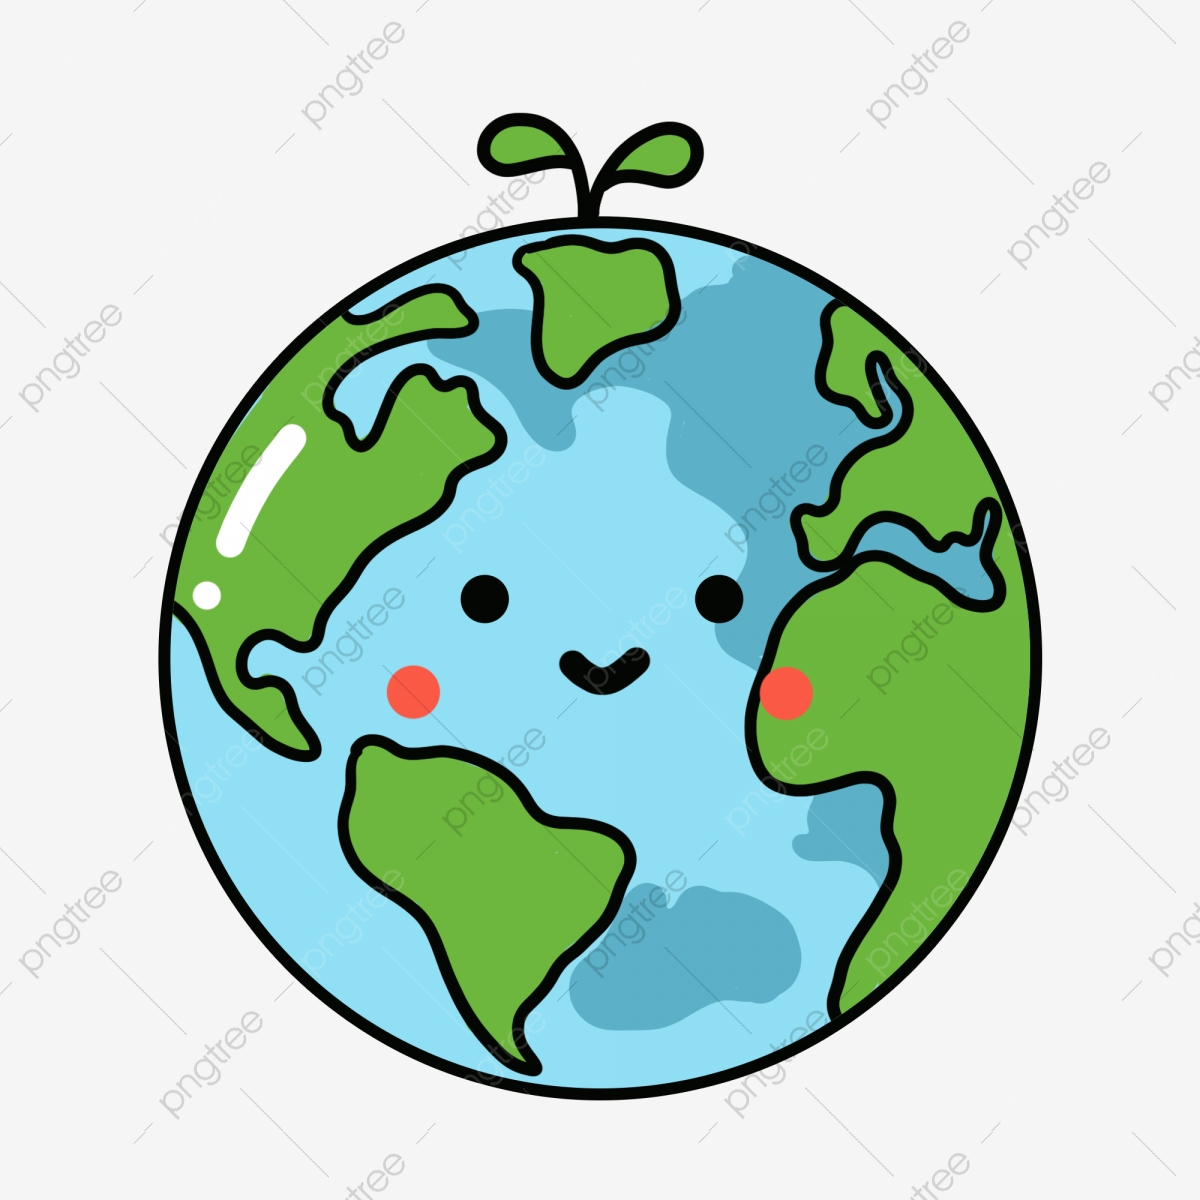 Green Earth Earth Plant Foliage, Foliage, Download, Green ...